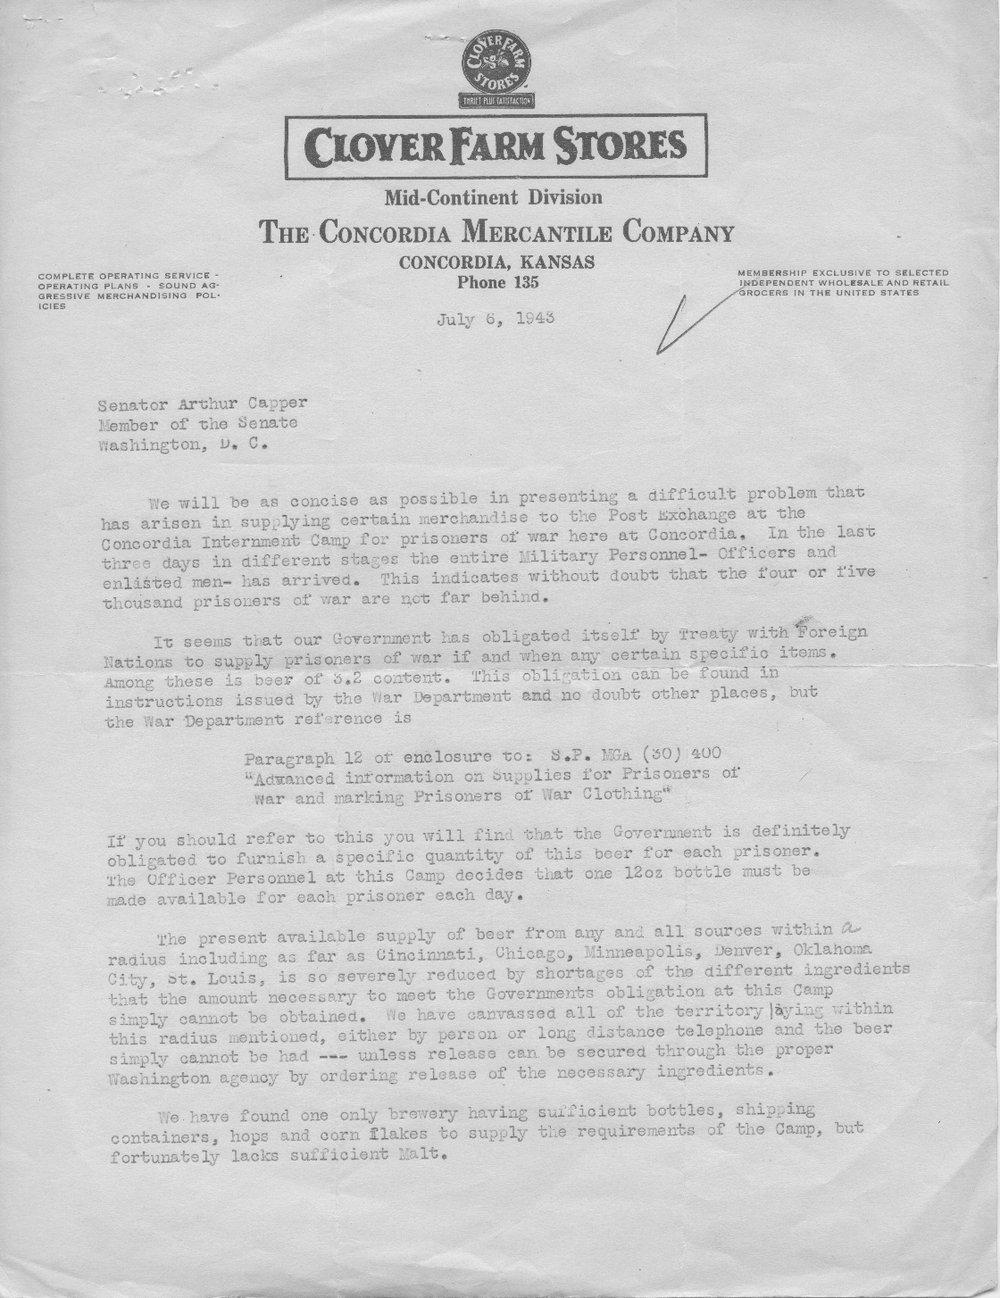 Donald Bolman to Senator Arthur Capper - 1